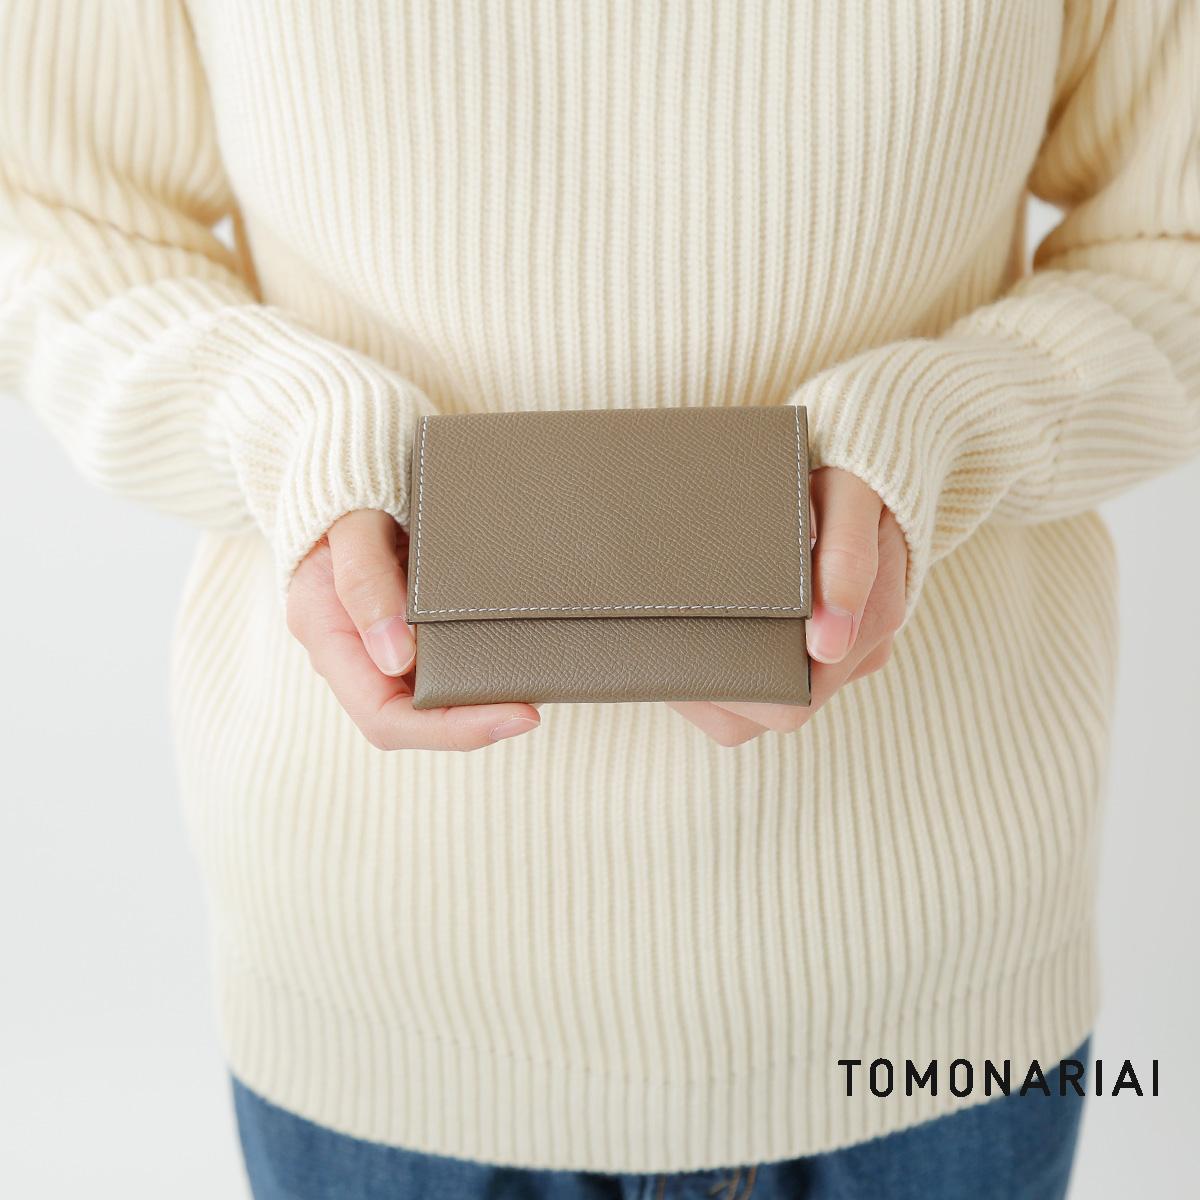 TOMO NARIAI(トモ ナリアイ)型押しカーフレザーウォレット wl19101